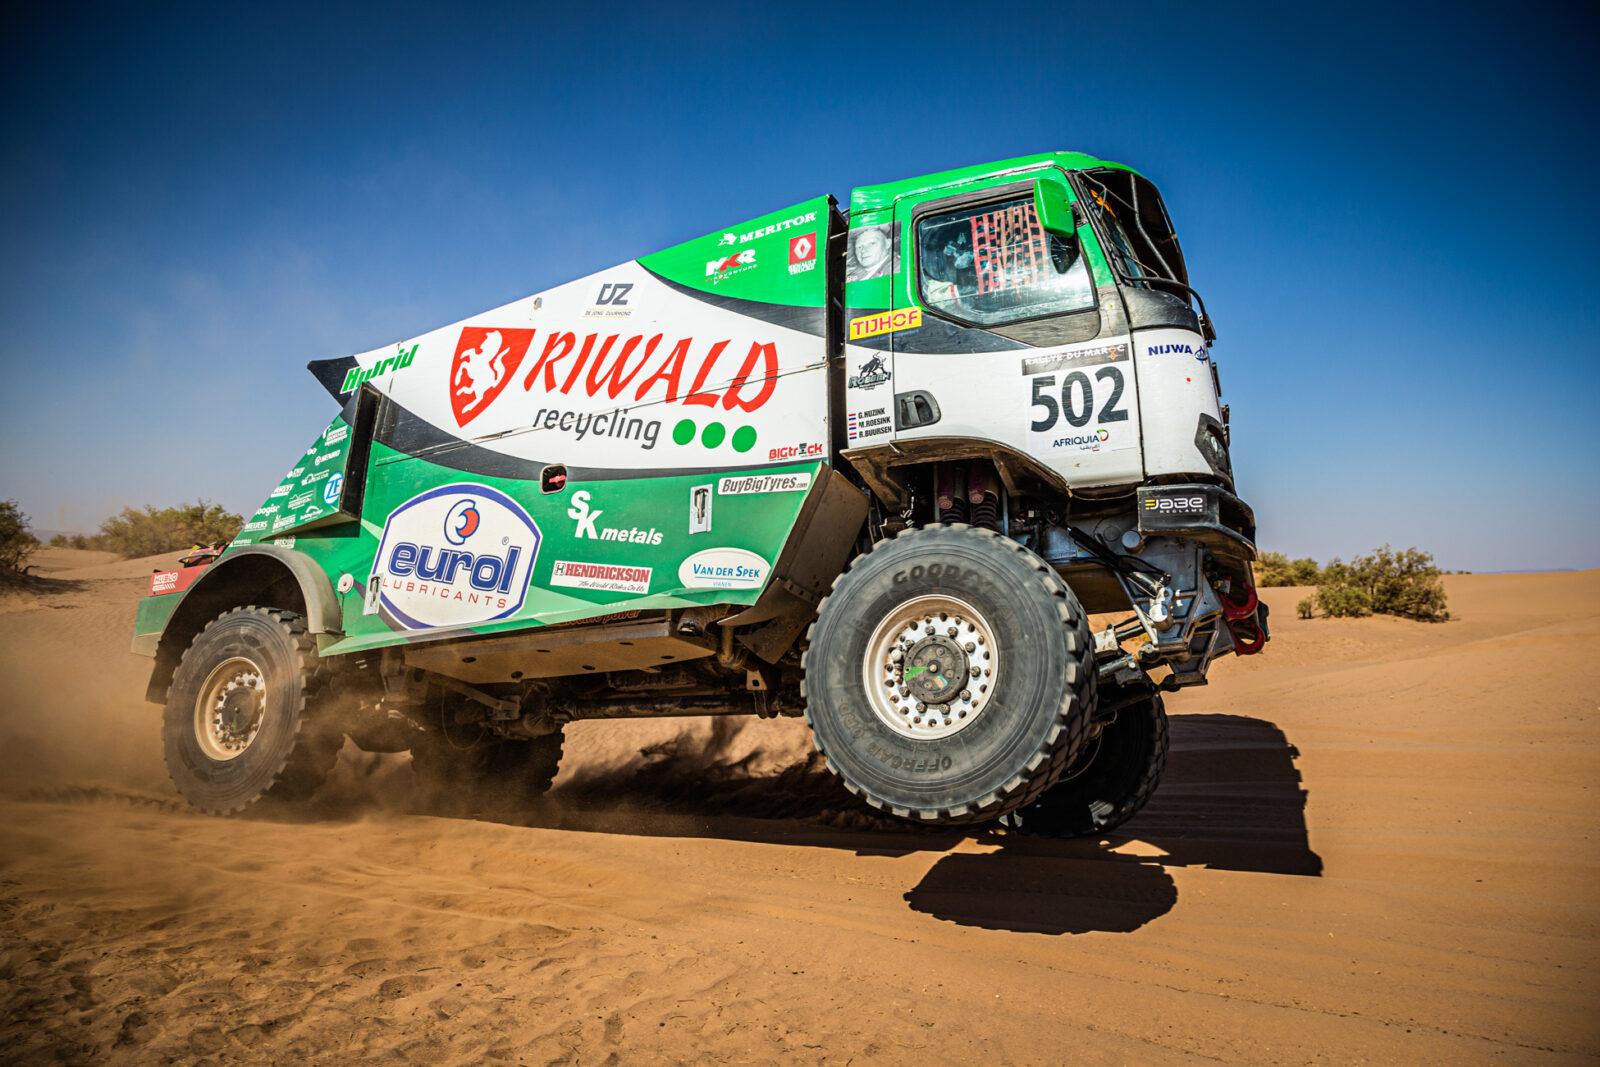 Rallye du Maroc - Stage 5